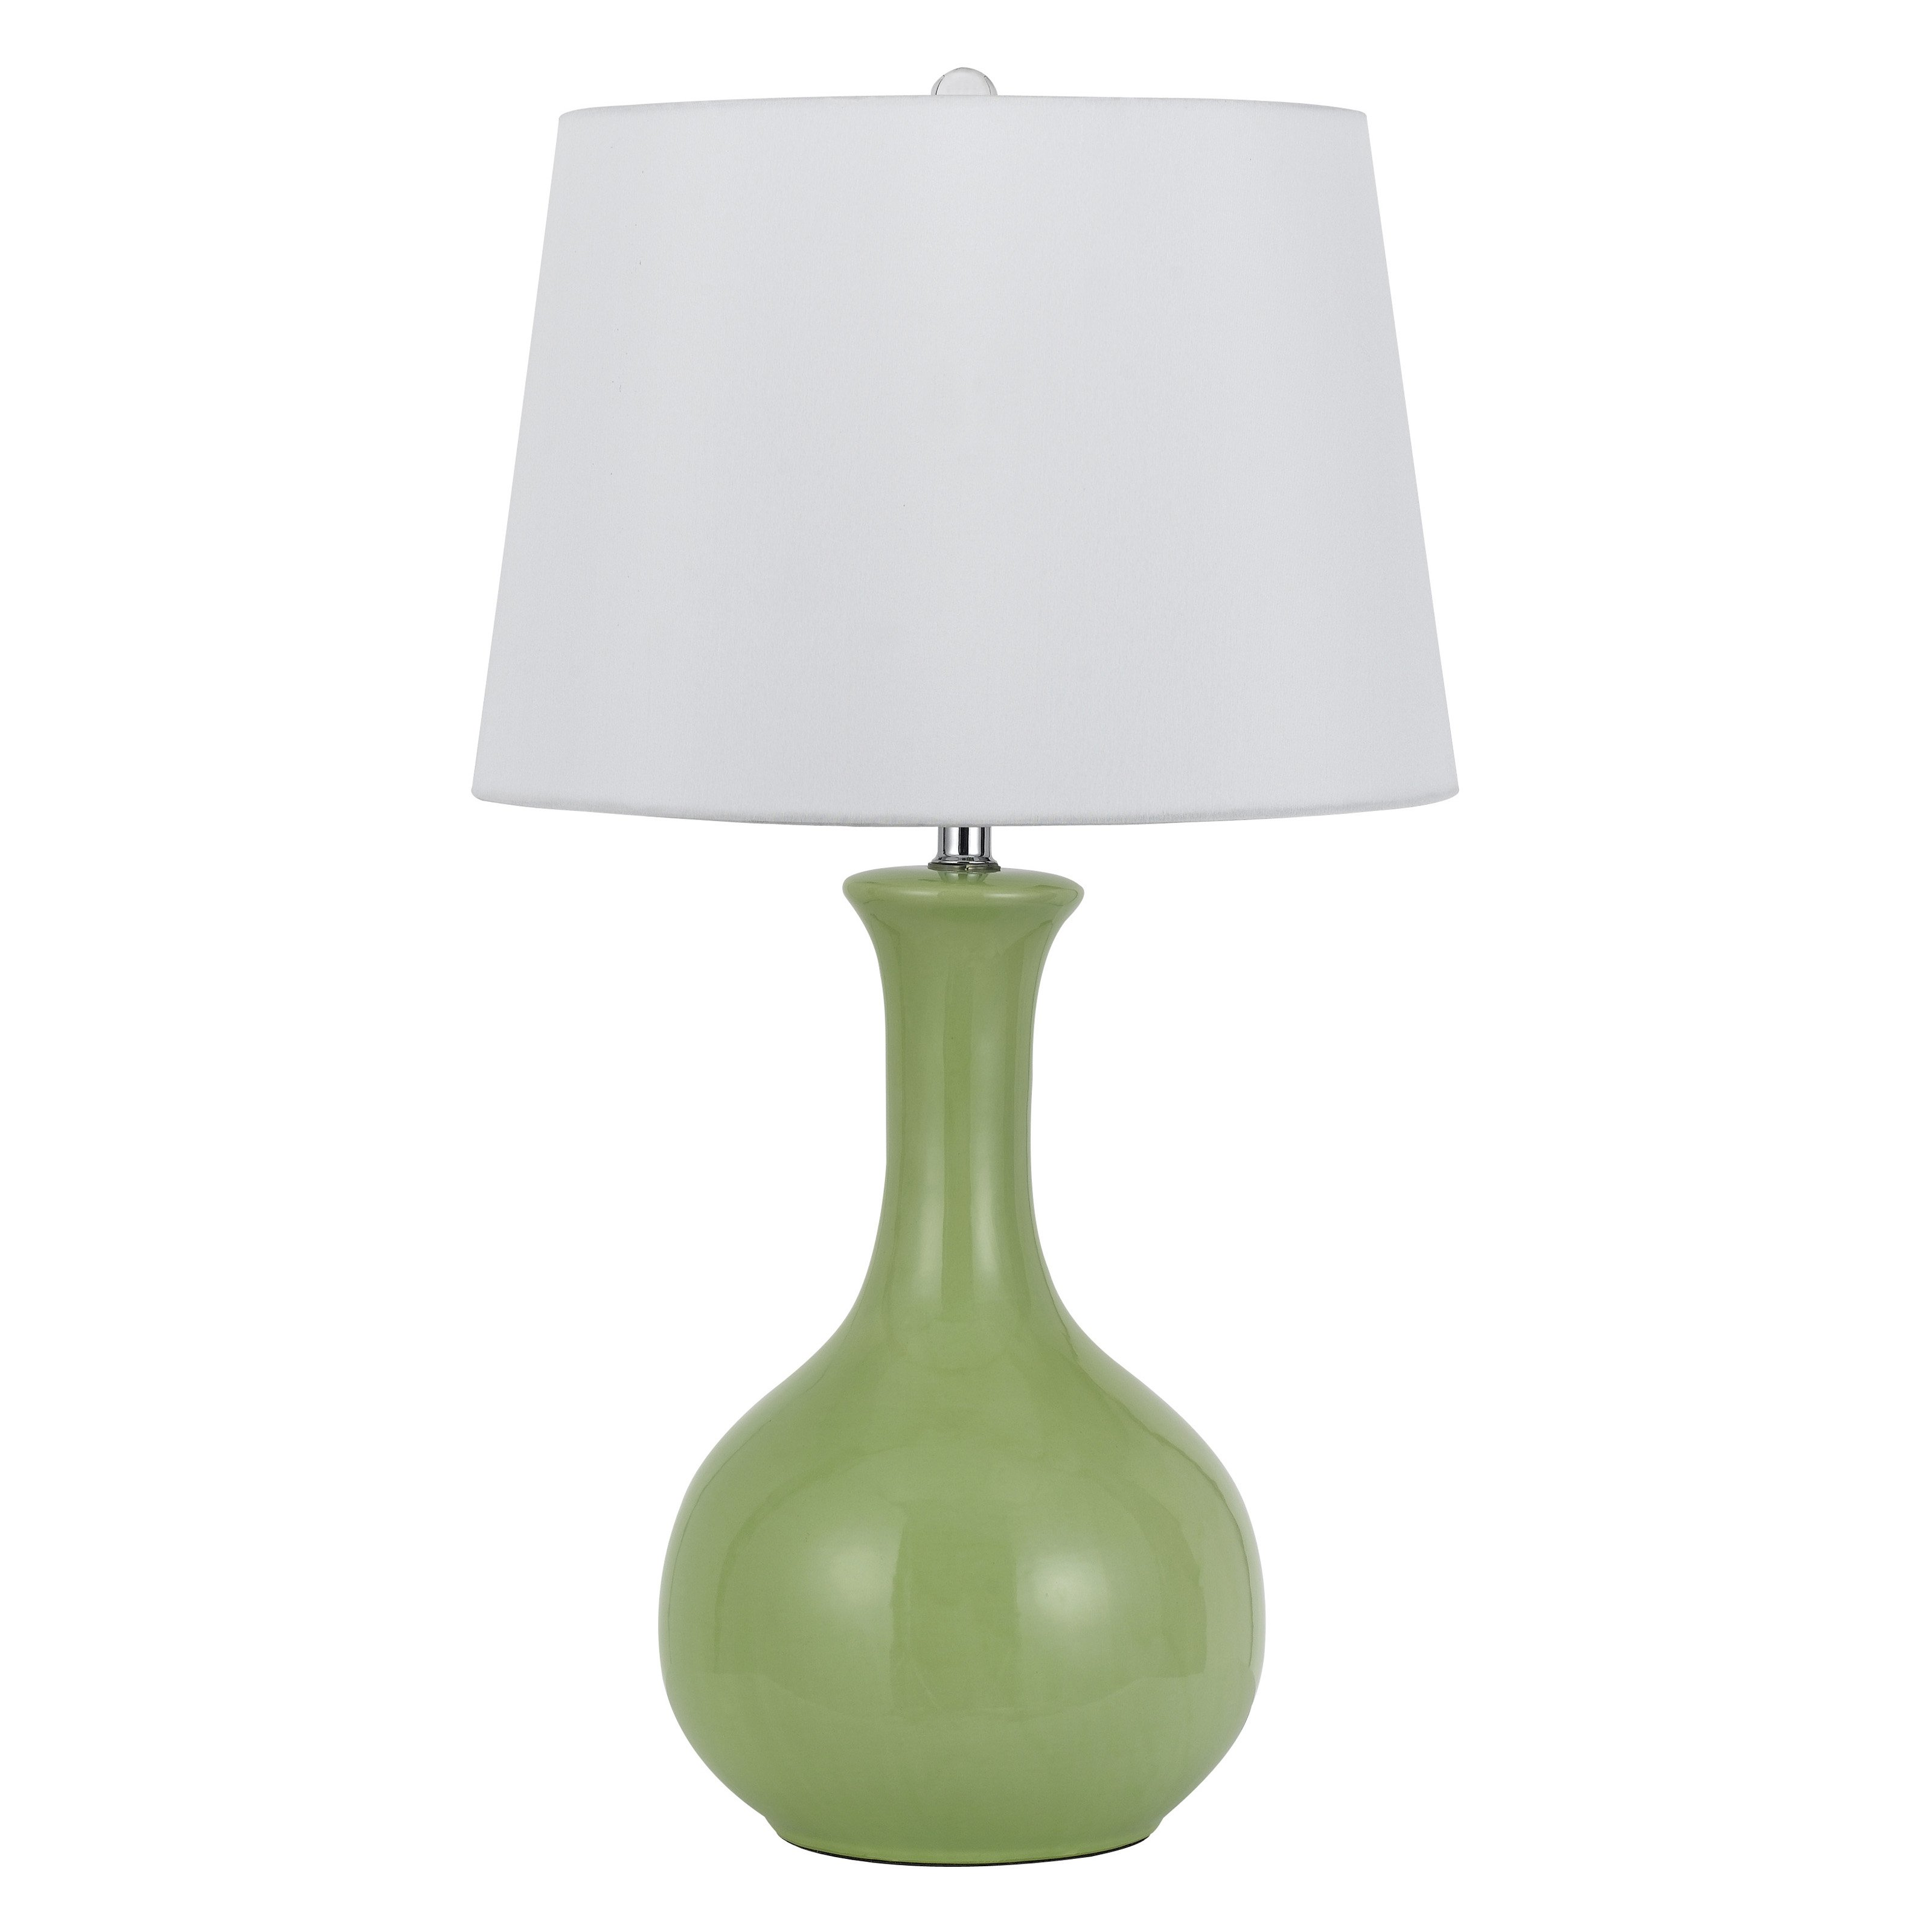 Cal Lighting Almeria BO-2584 Table Lamp by CAL Lighting